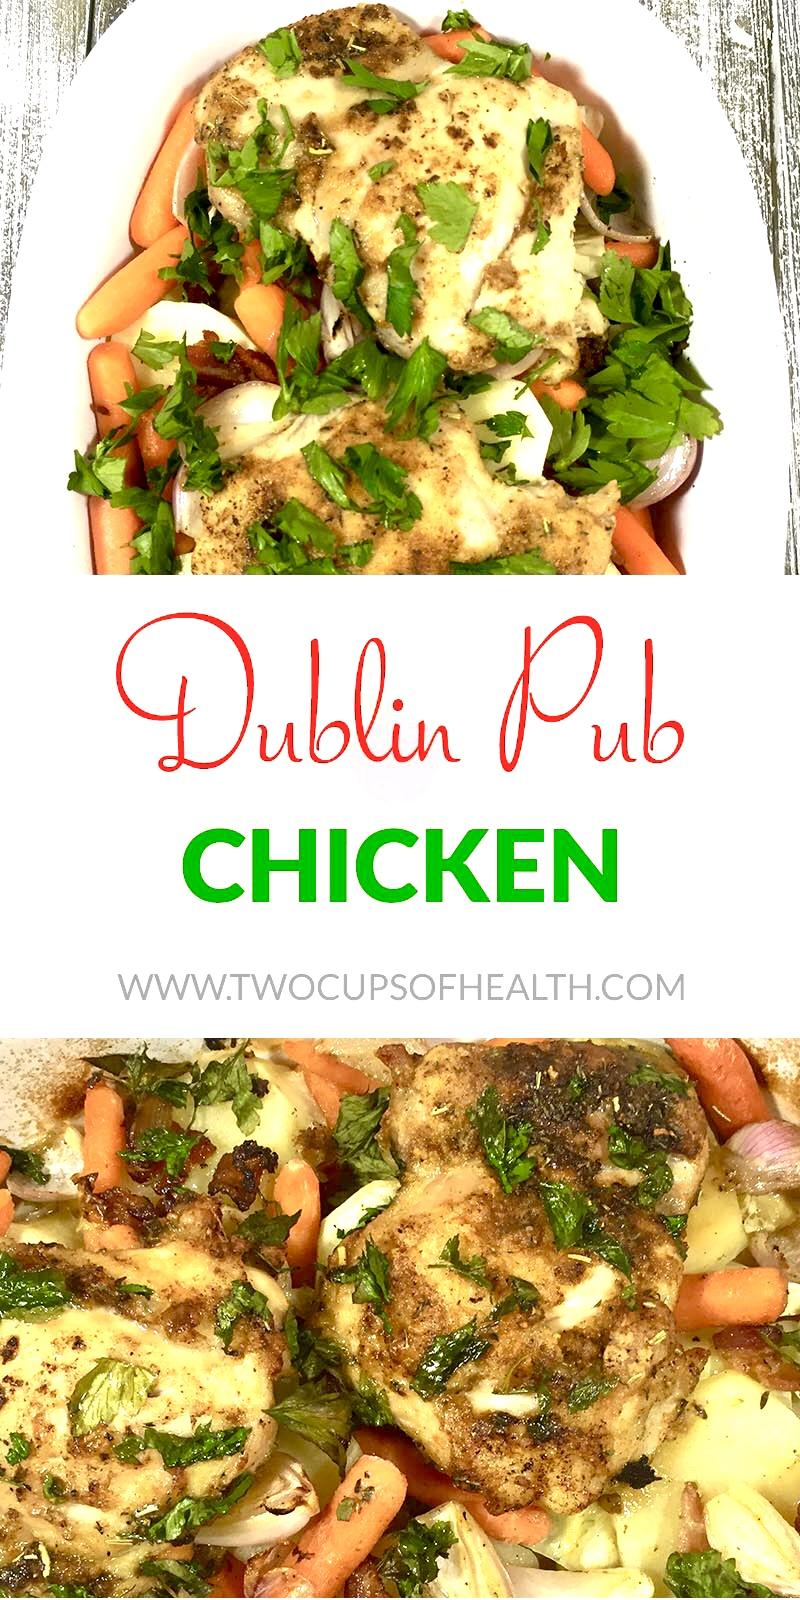 Dublin Pub Chicken Pinterest Pin